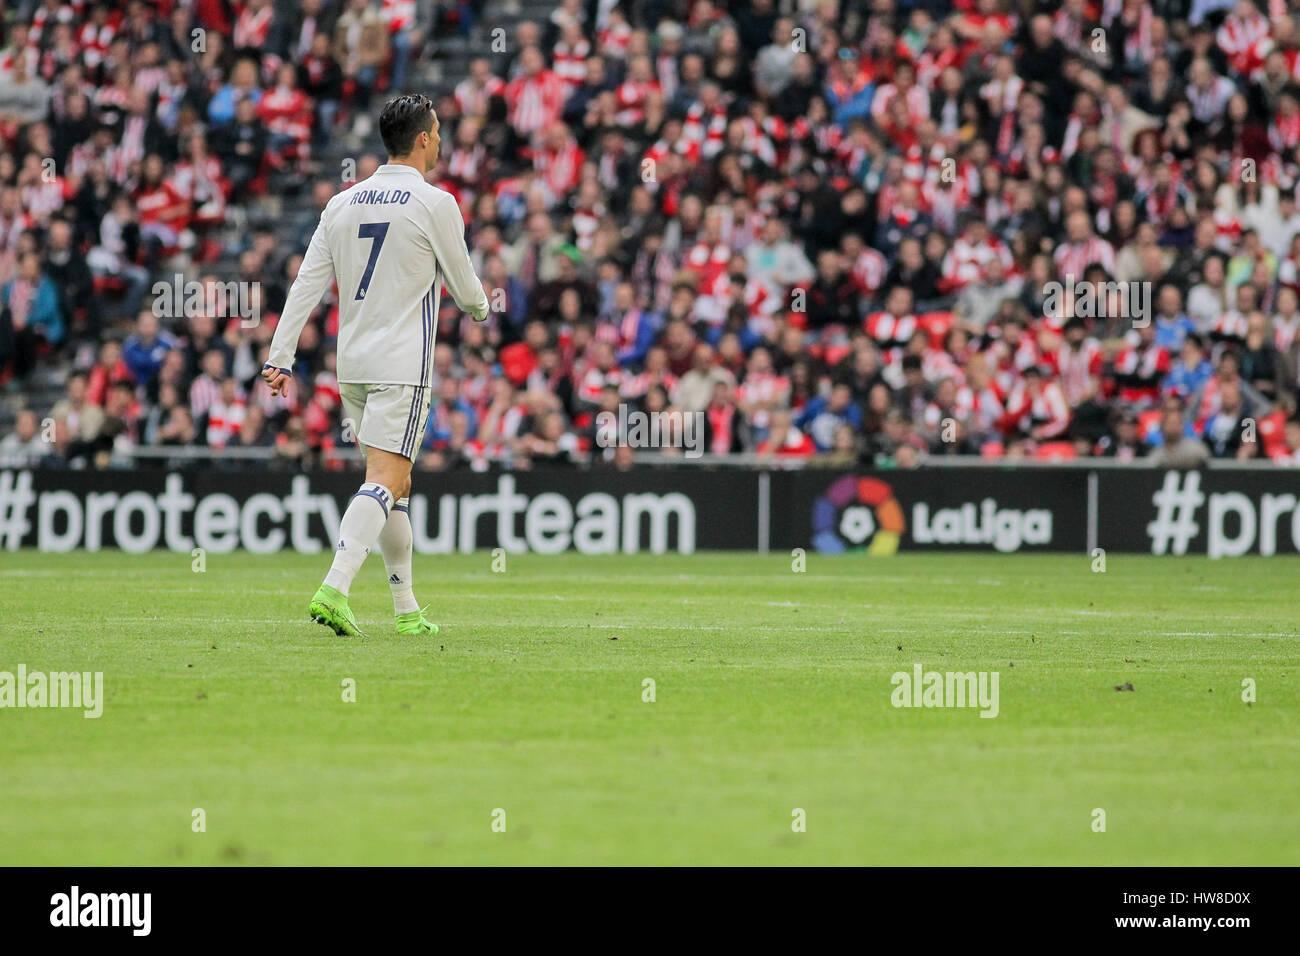 Bilbao, Vizcaya, Spain. 18th March, 2017. Cristiano Ronaldo during the Liga Santander match between Athletic Bilbao - Stock Image